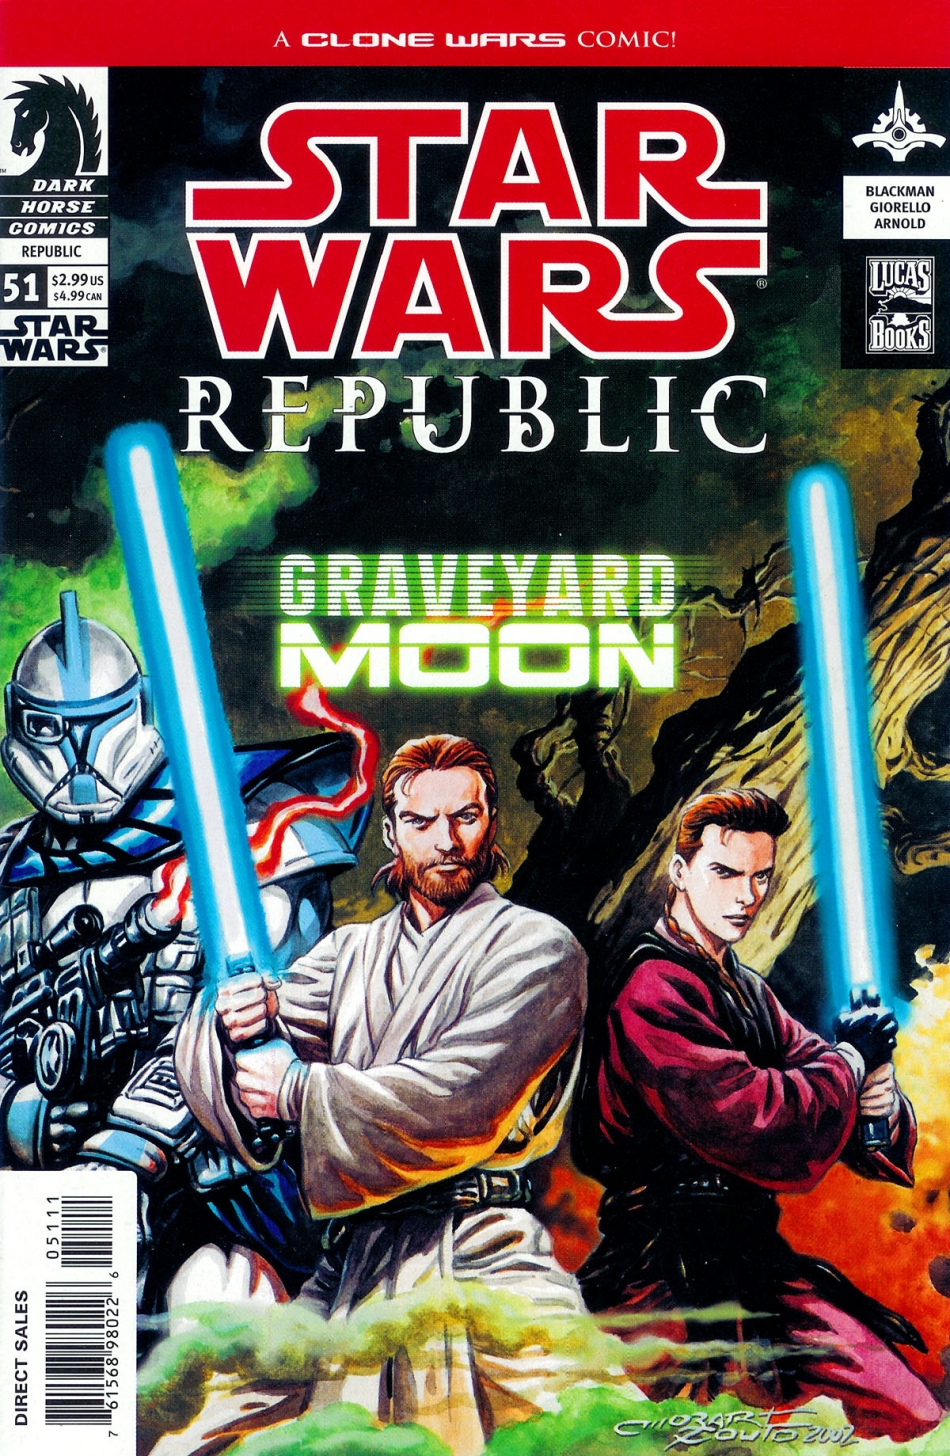 Republic #51: The New Face of War, Part 1 (19.03.2003)